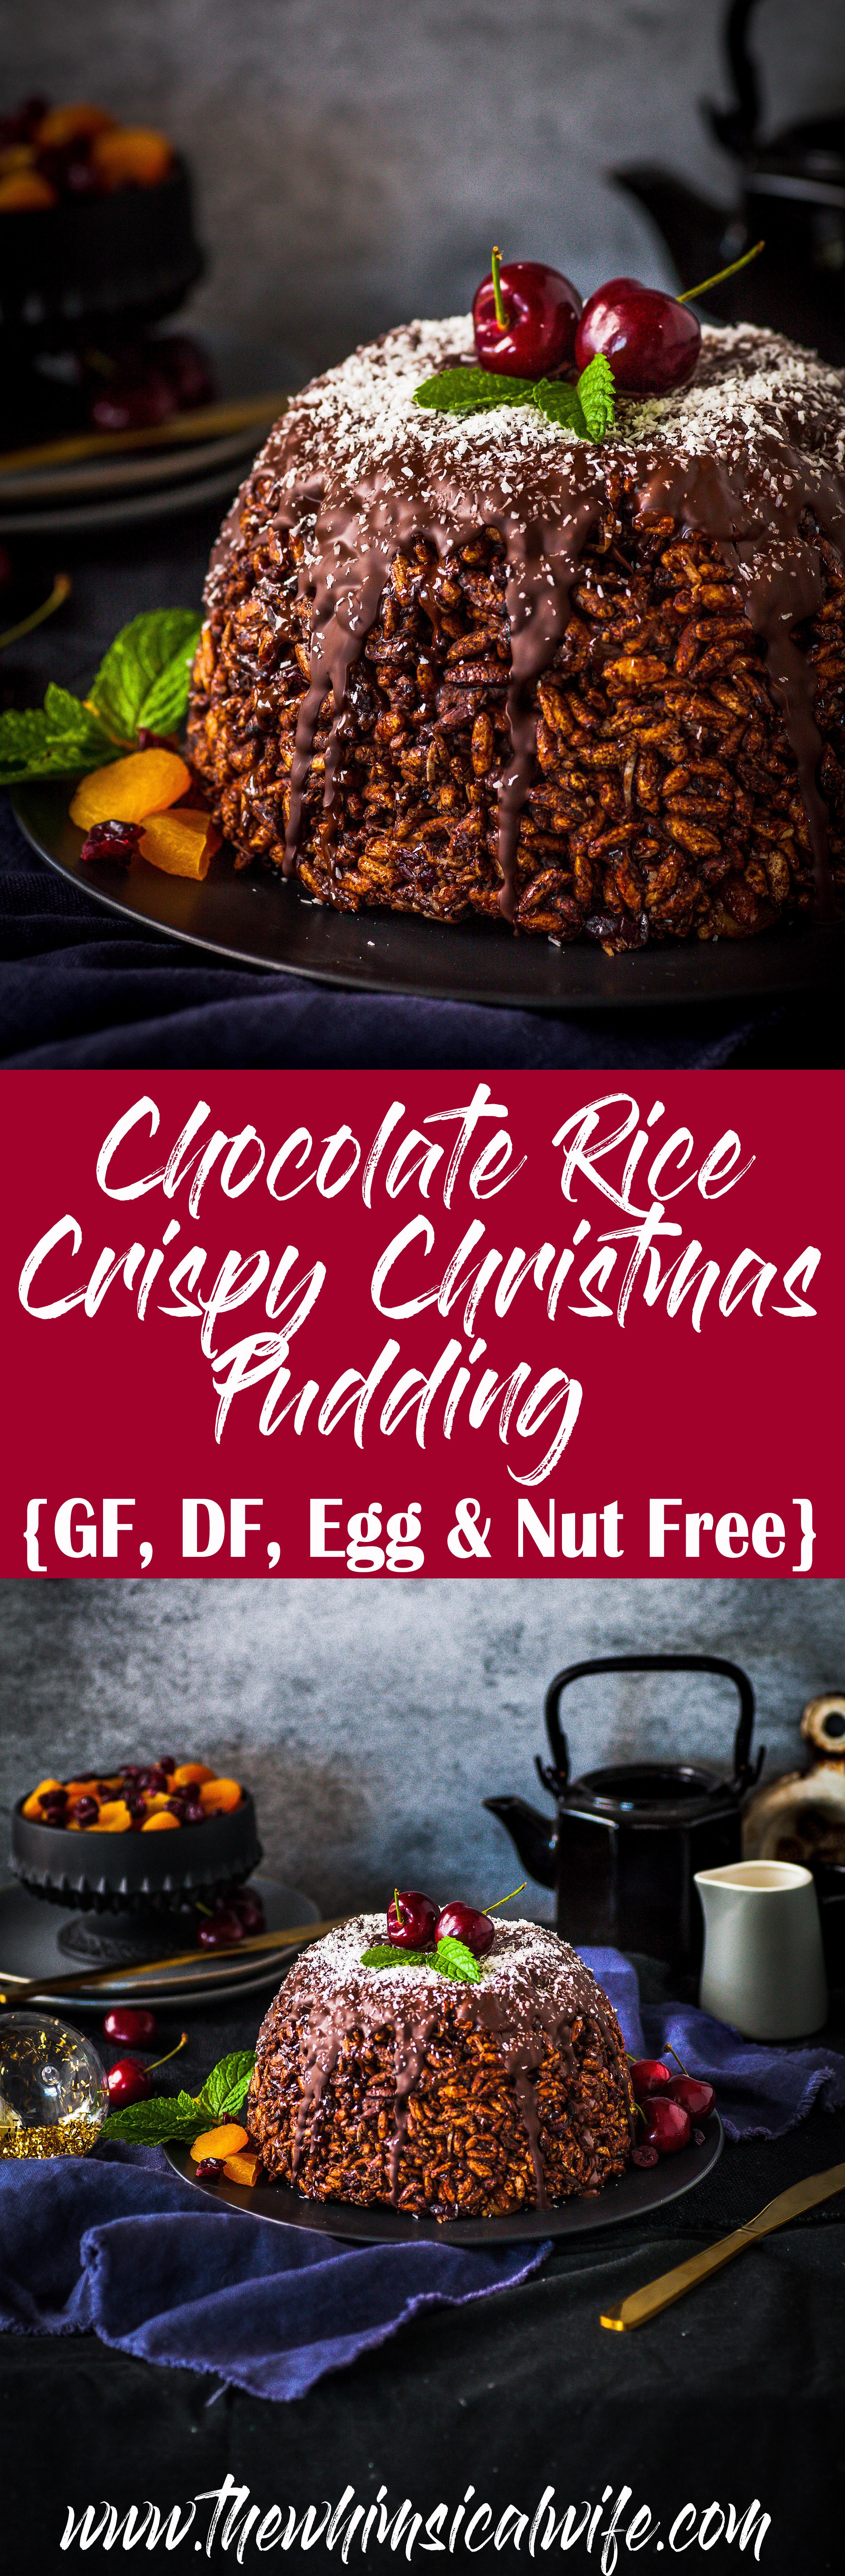 Chocolate Rice Crispy Christmas Pudding (GF, DF, Nut & Egg Free) - thewhimsicalwife.com